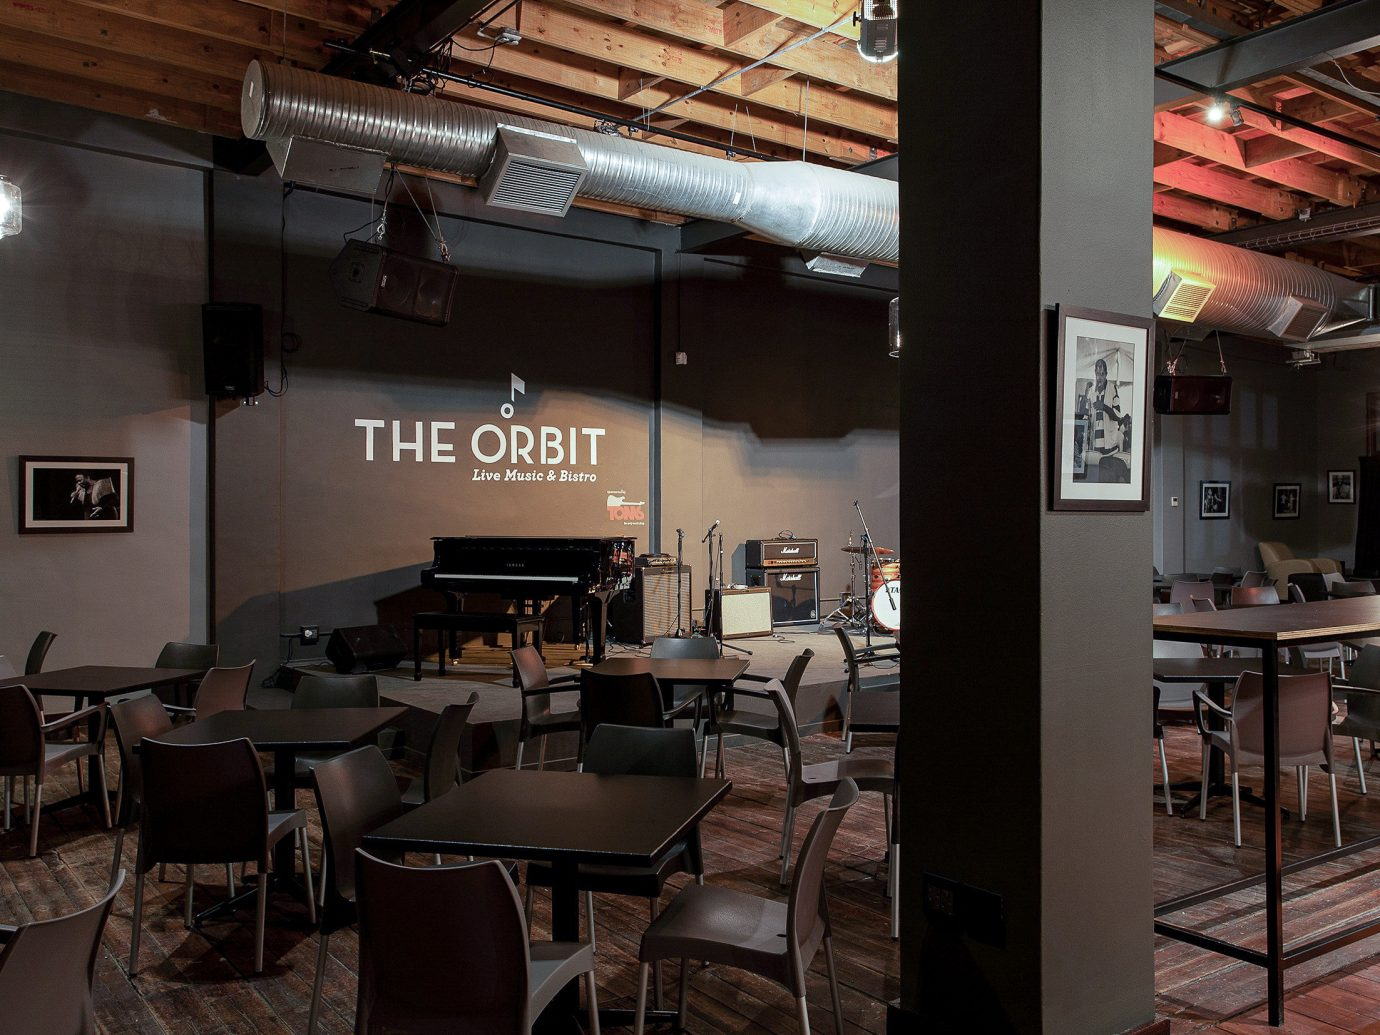 Arts + Culture Trip Ideas indoor chair floor room restaurant interior design ceiling café coffeehouse table area furniture several